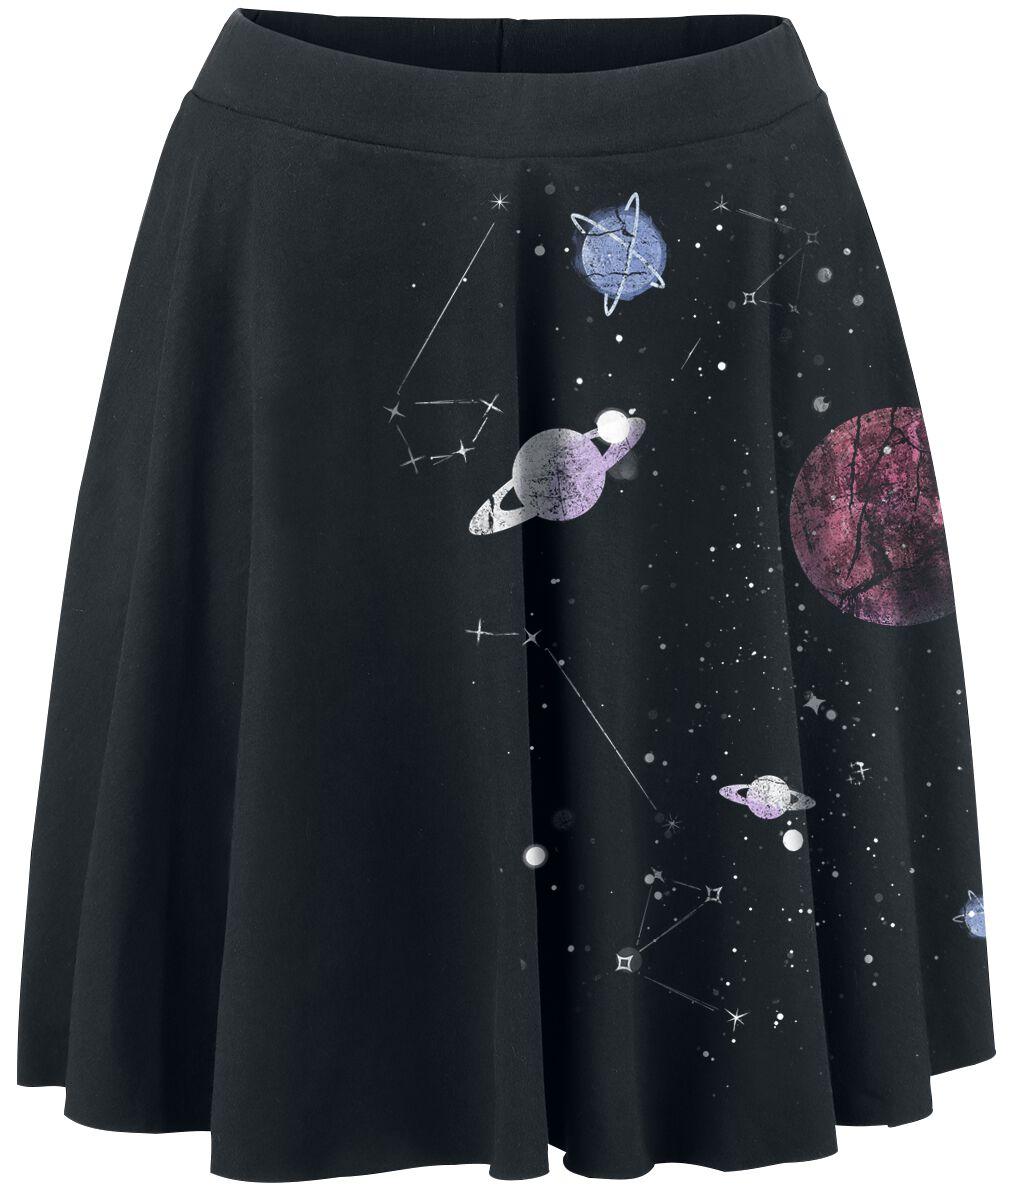 Image of   Outer Vision Planetarium Nederdel sort